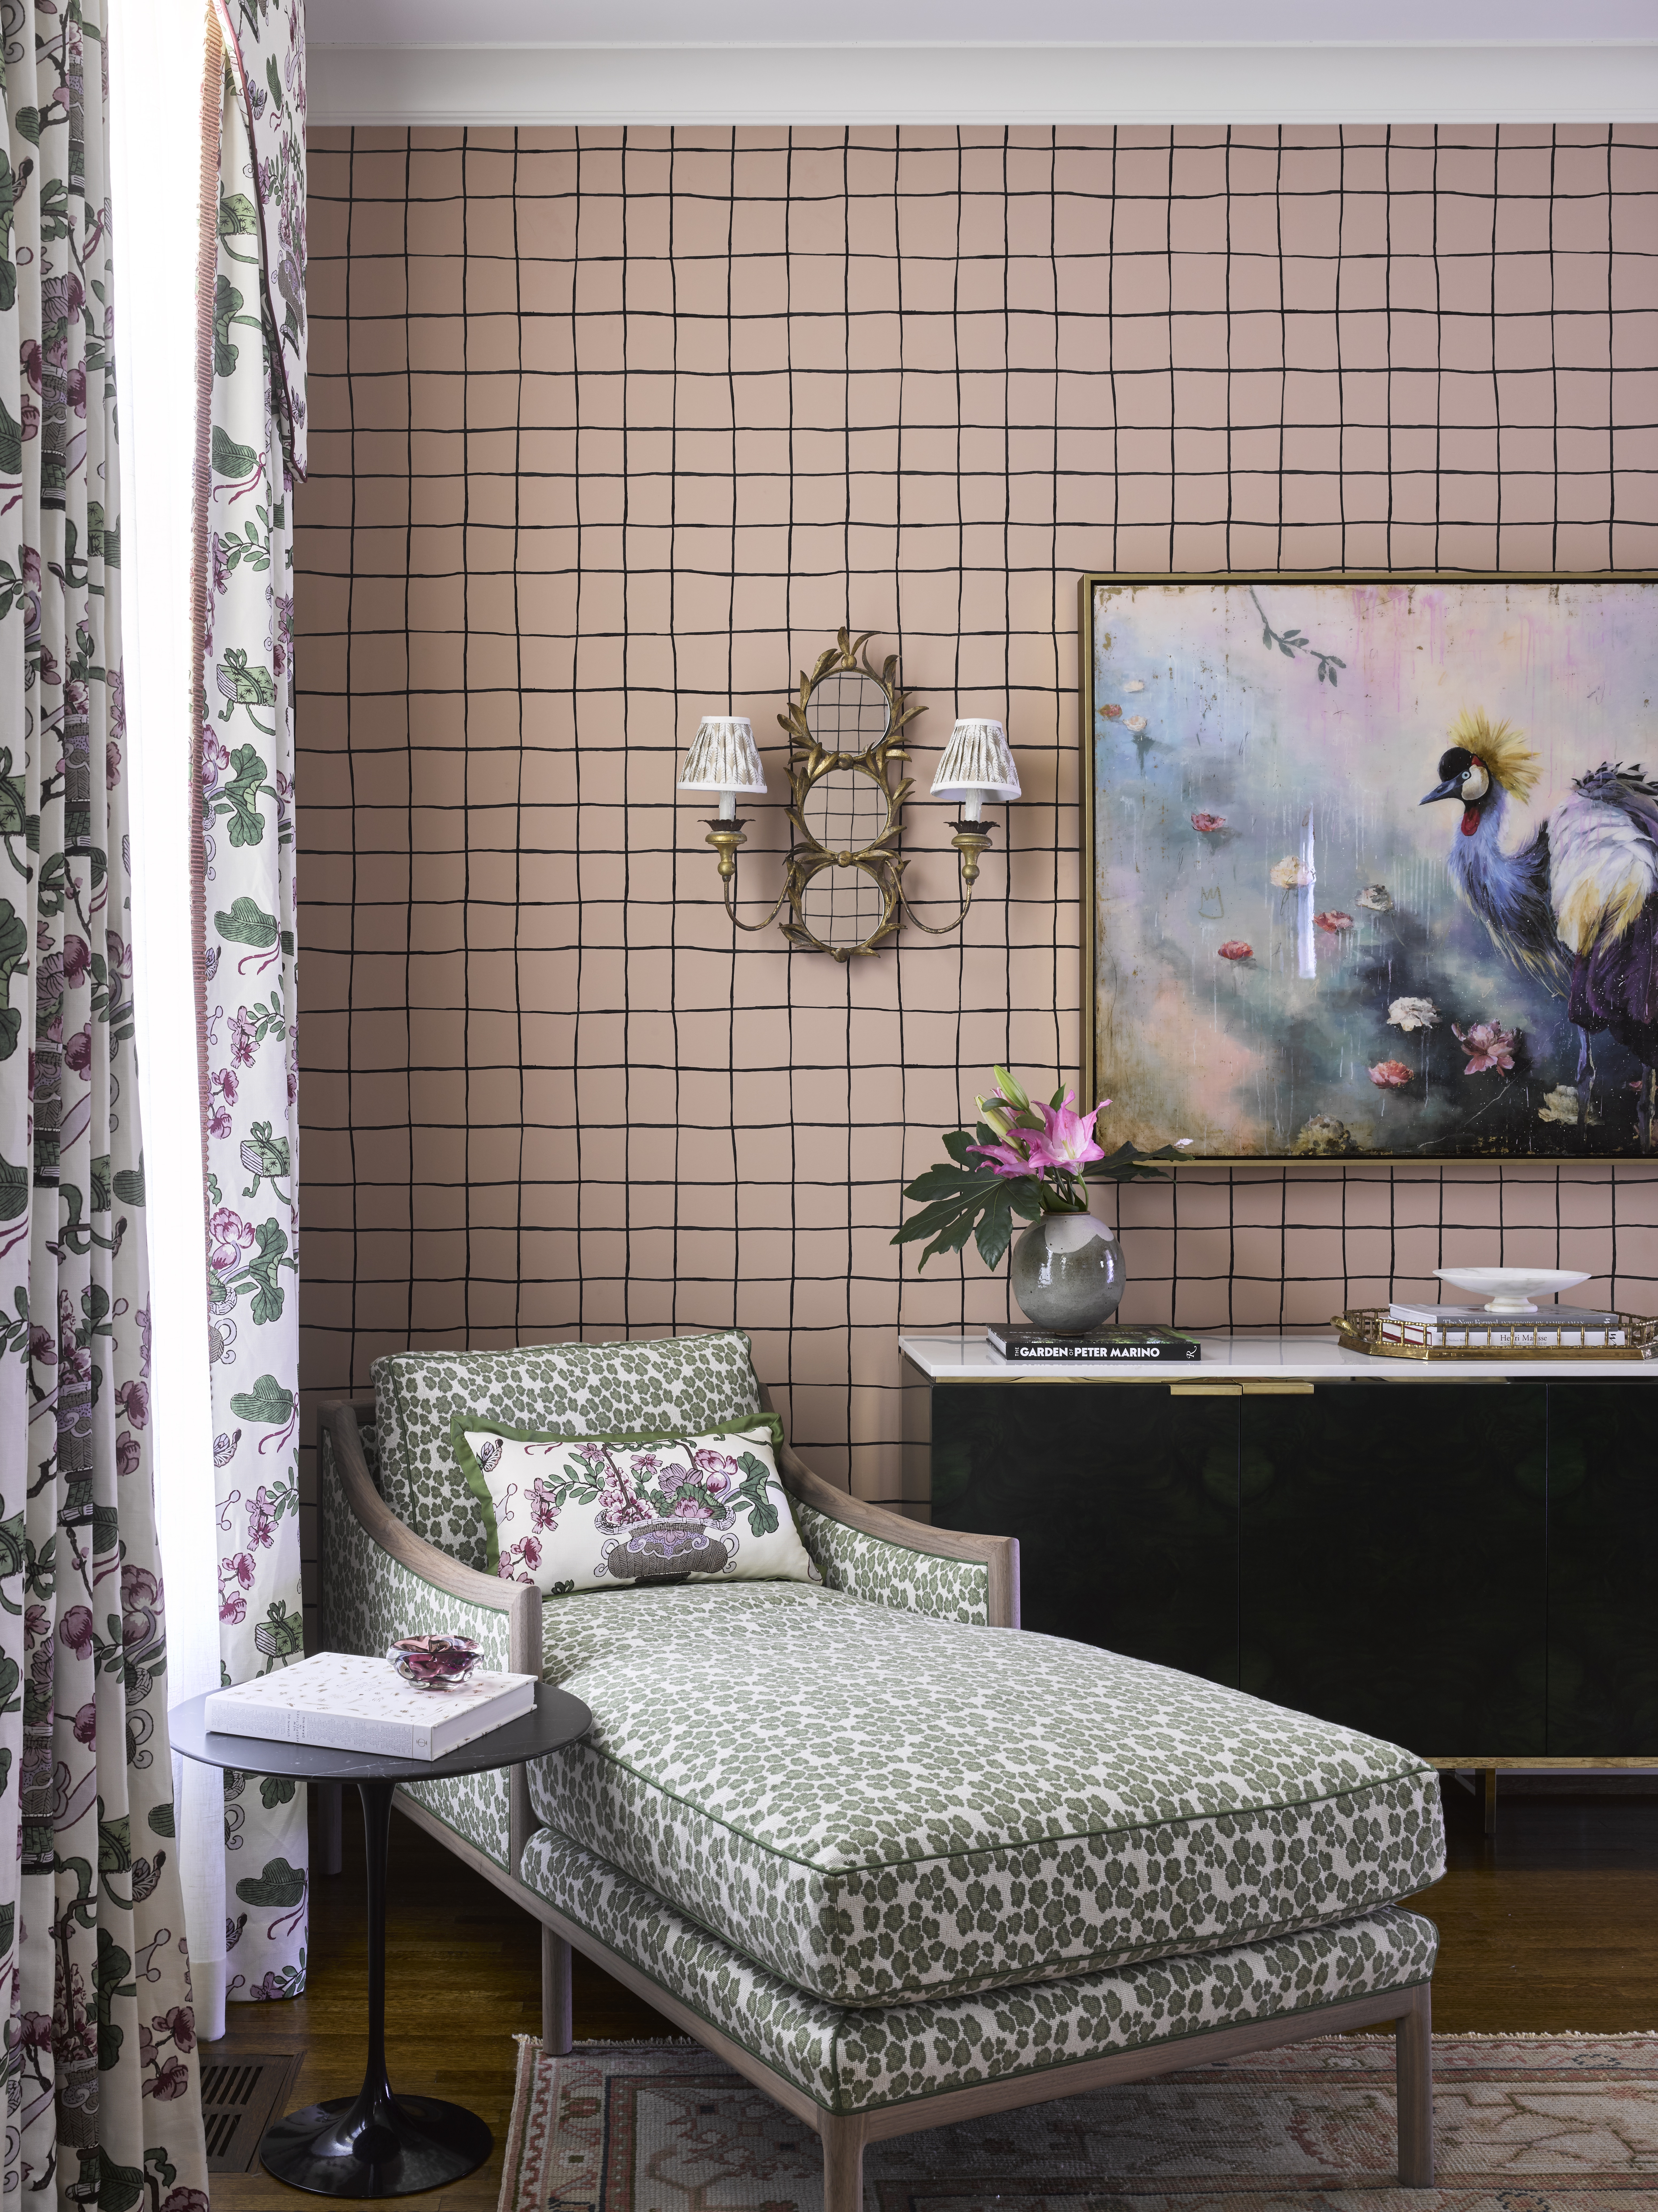 designer charlotte lucas favorite room